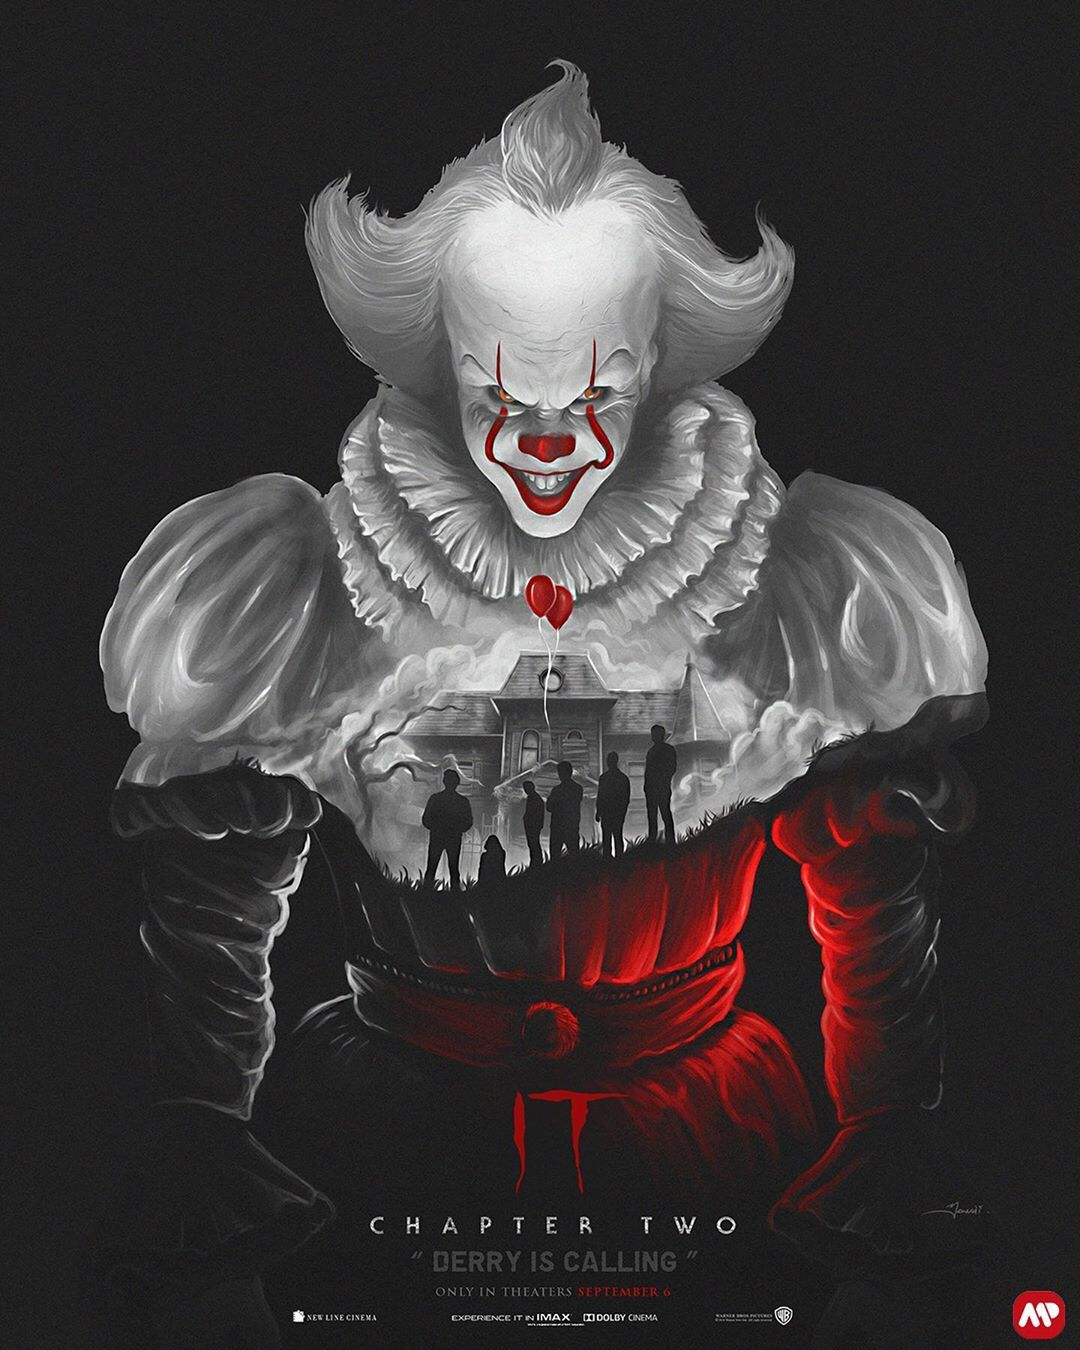 Pin By Xxiidreamxx On ɪᴛ Horror Movie Art Horror Posters